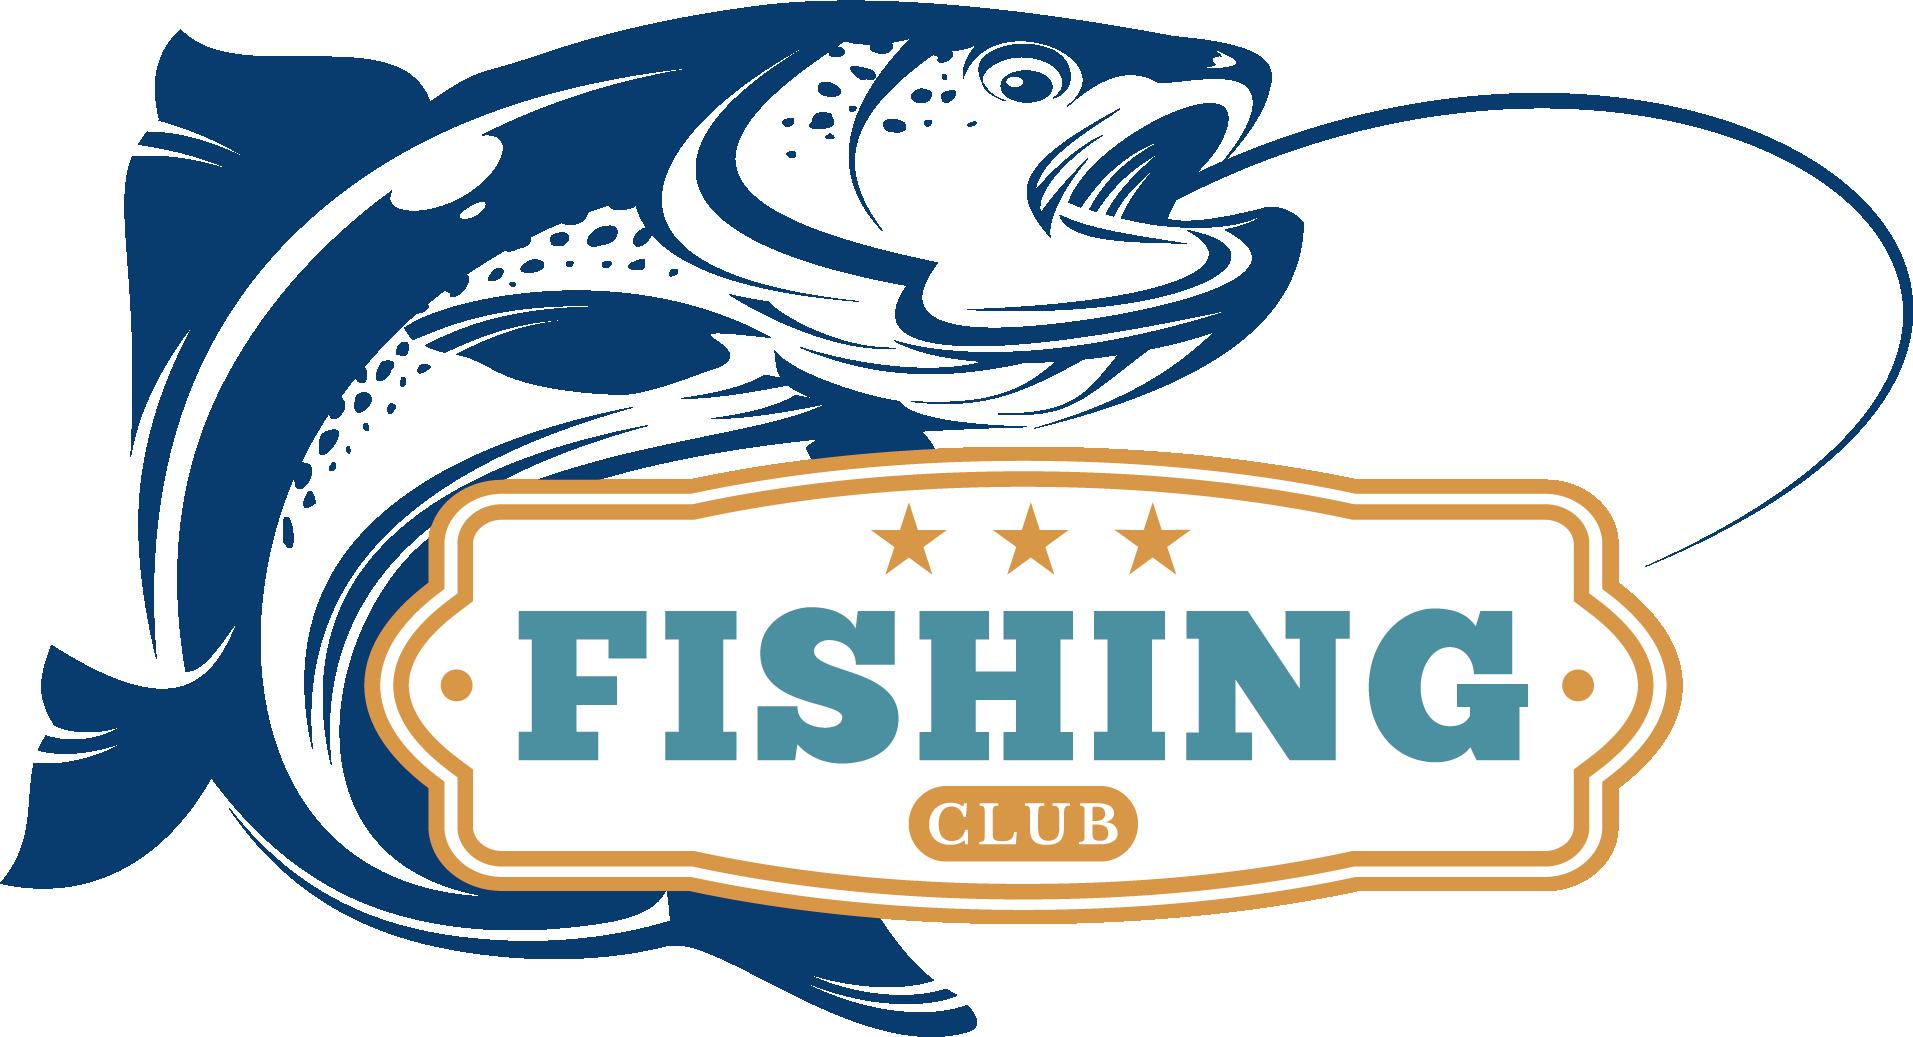 Fishing rod fly angling. Organization clipart club organization